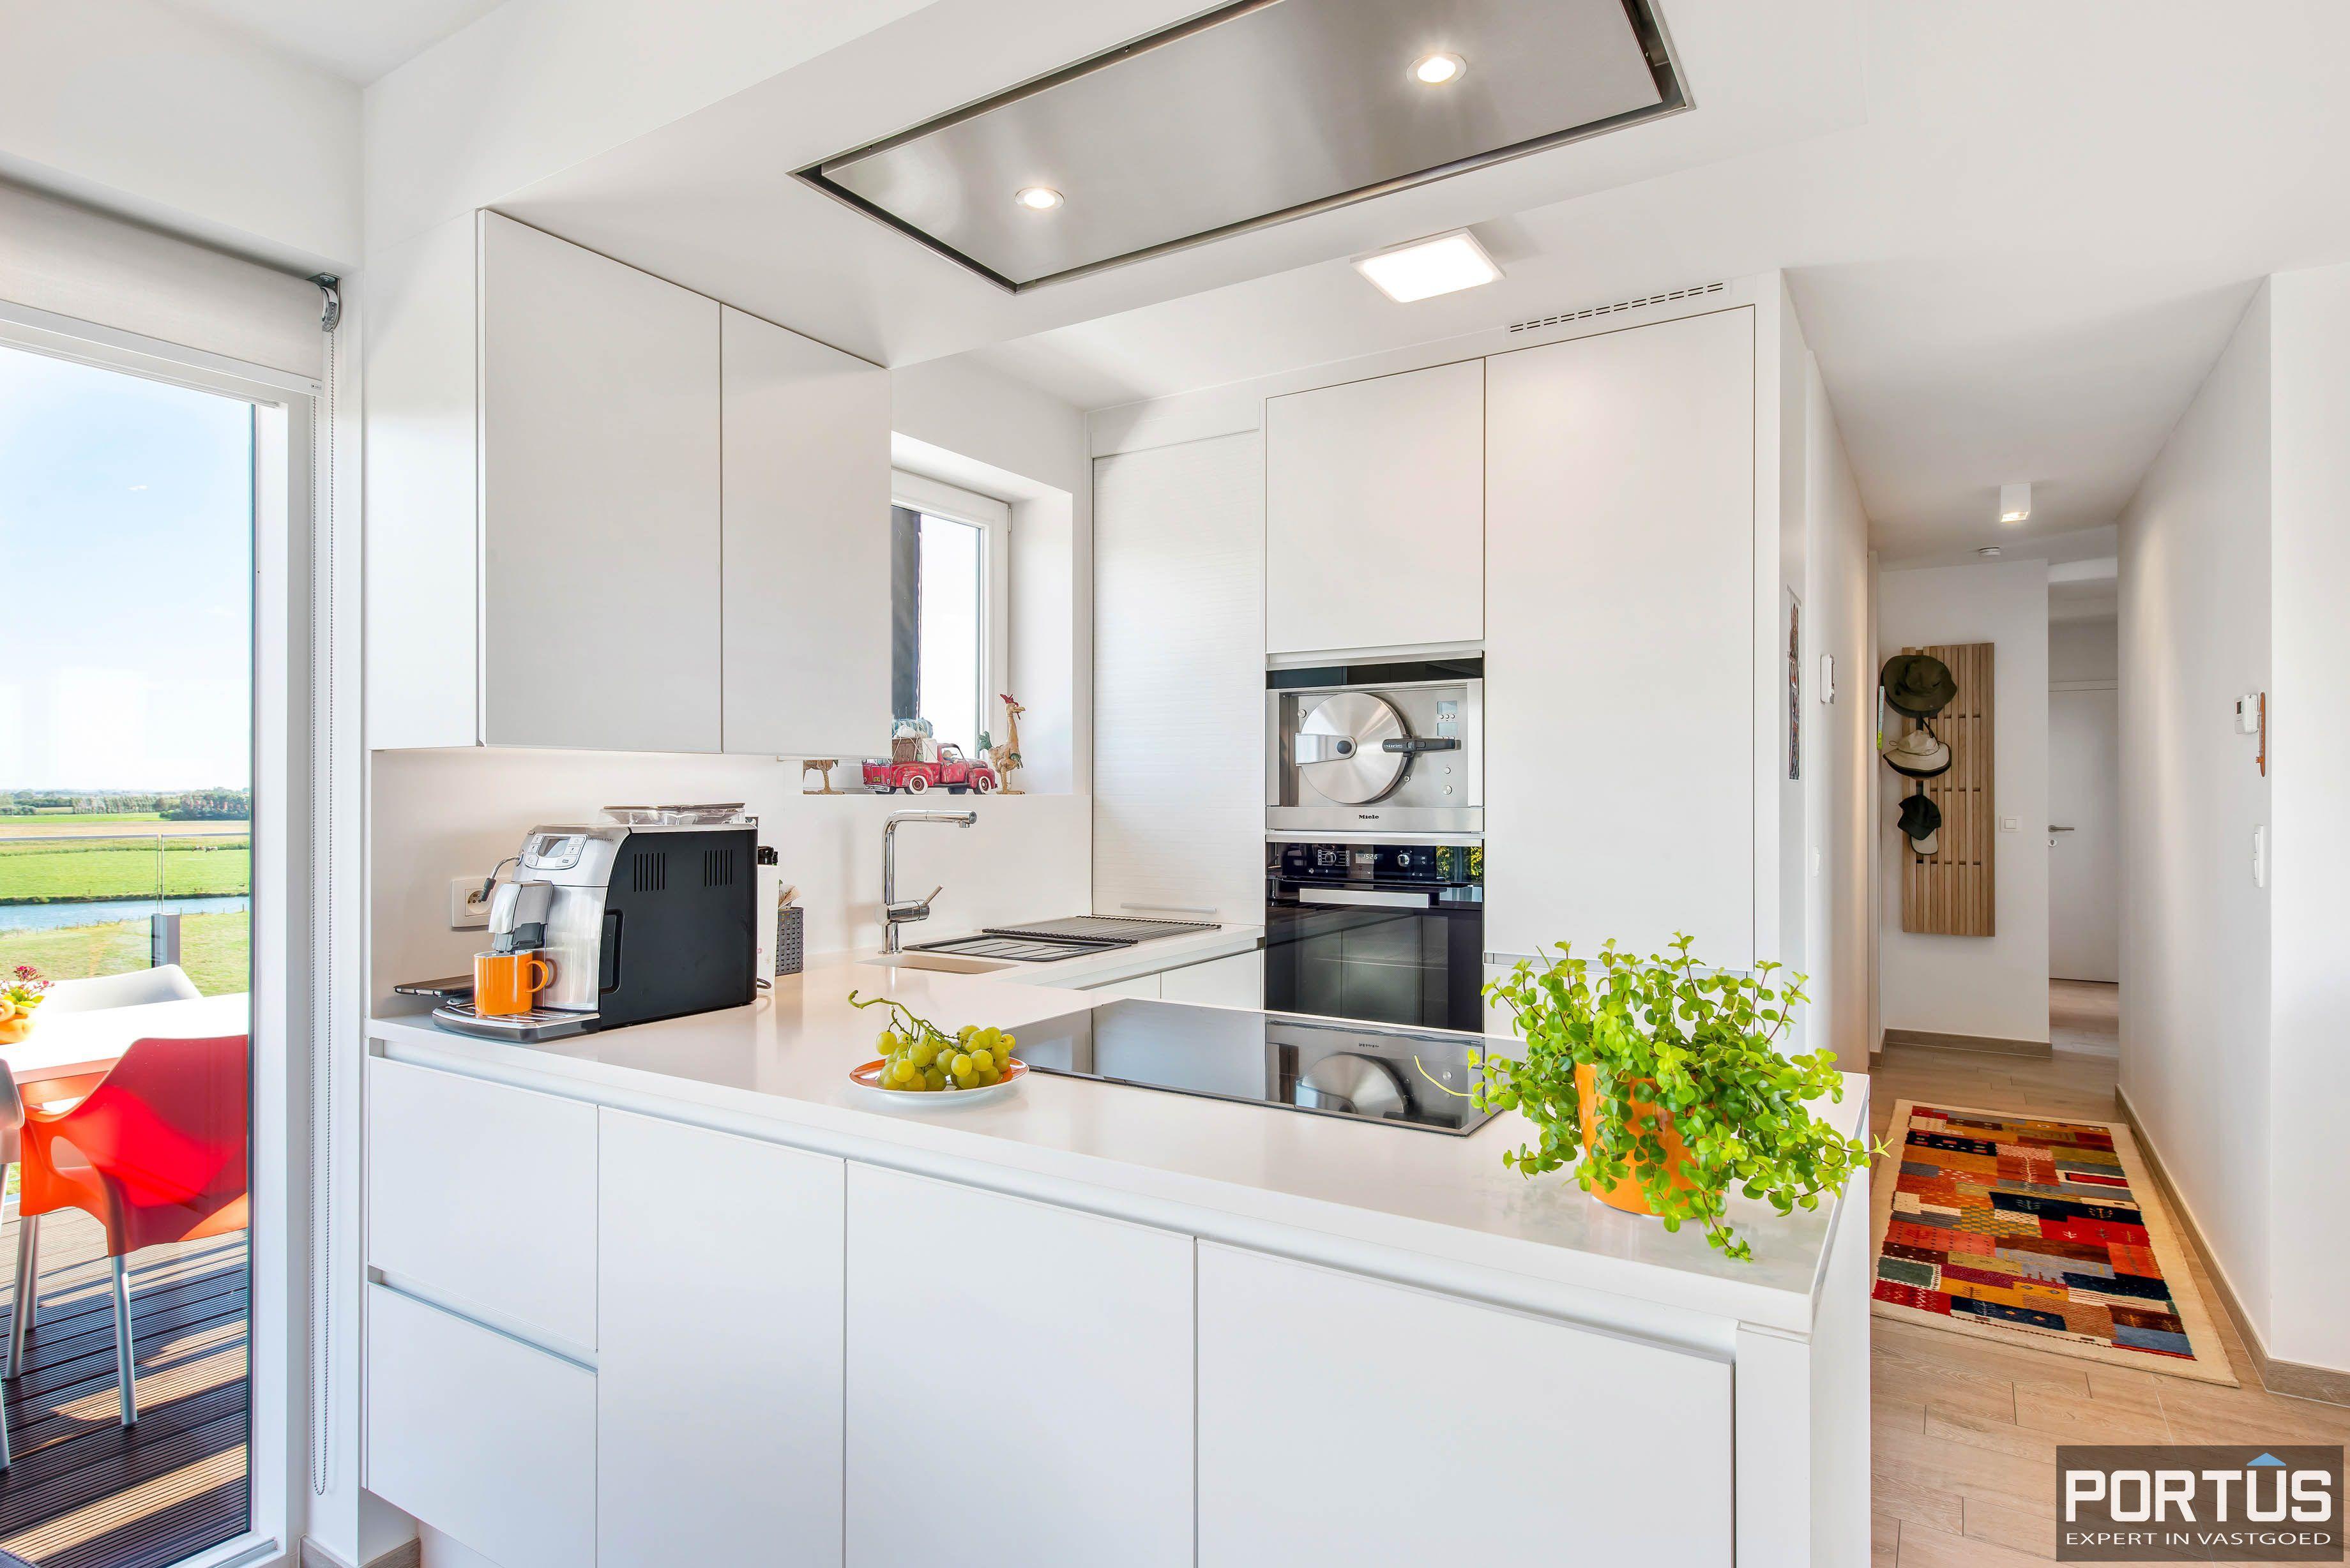 Exclusieve penthouse met 3 slaapkamers te koop te Nieuwpoort - 10944